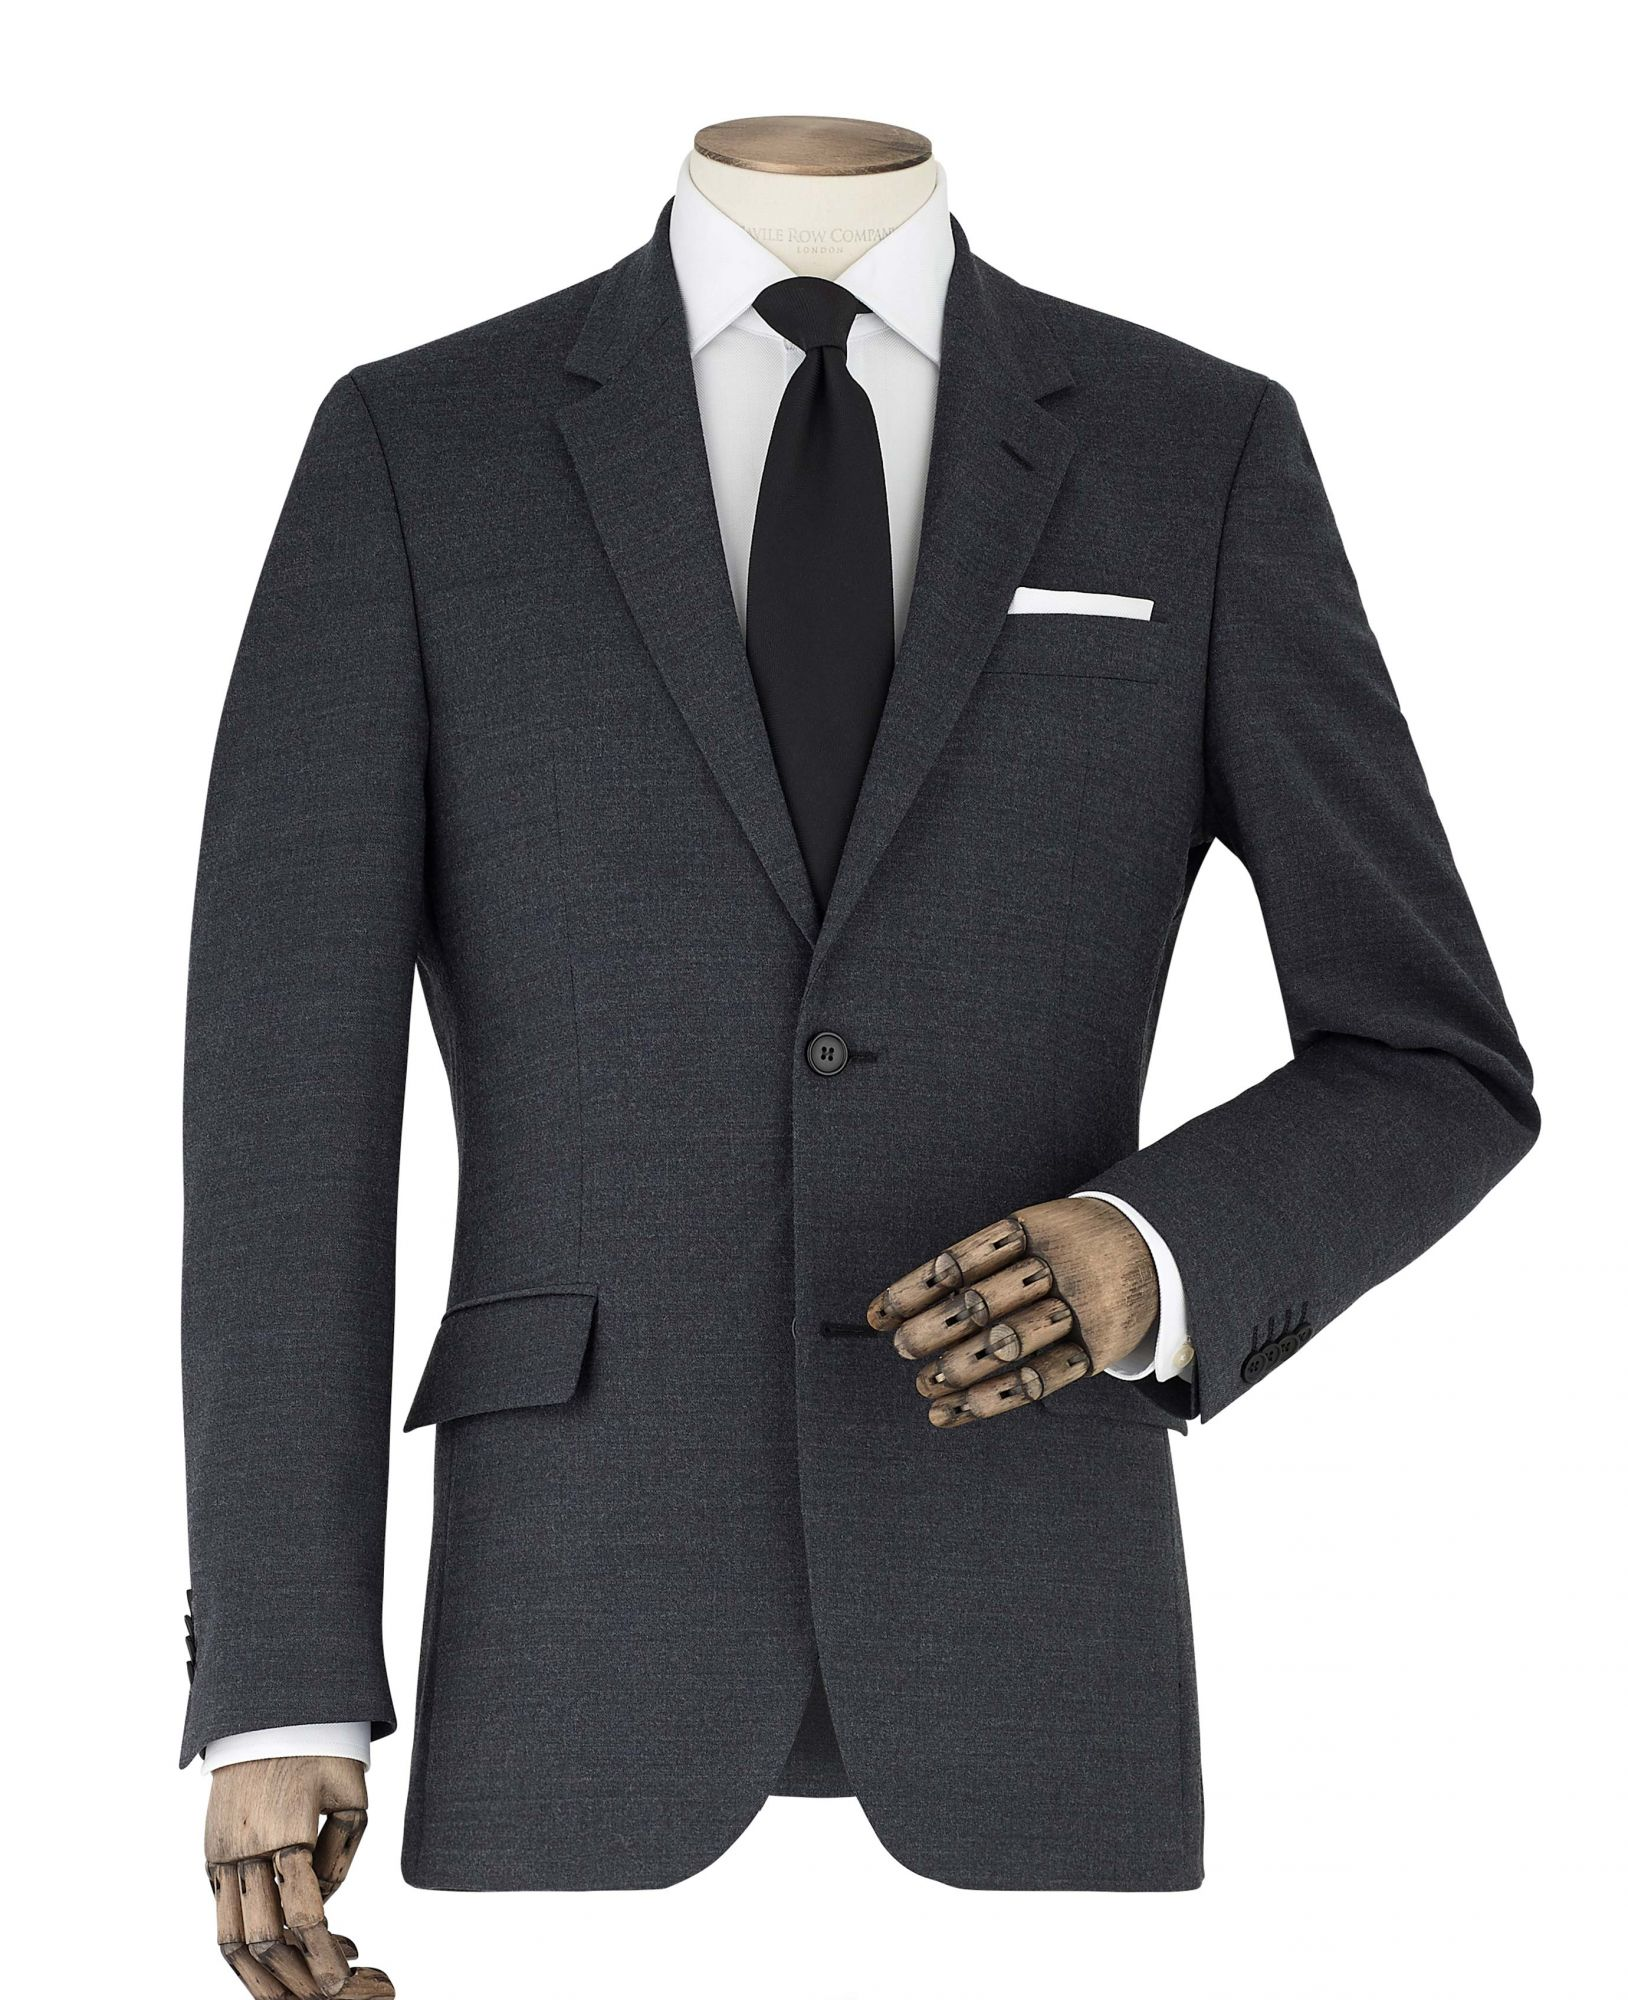 Men's Suits Dark Grey Wool-Blend Tailored Suit Jacket 36